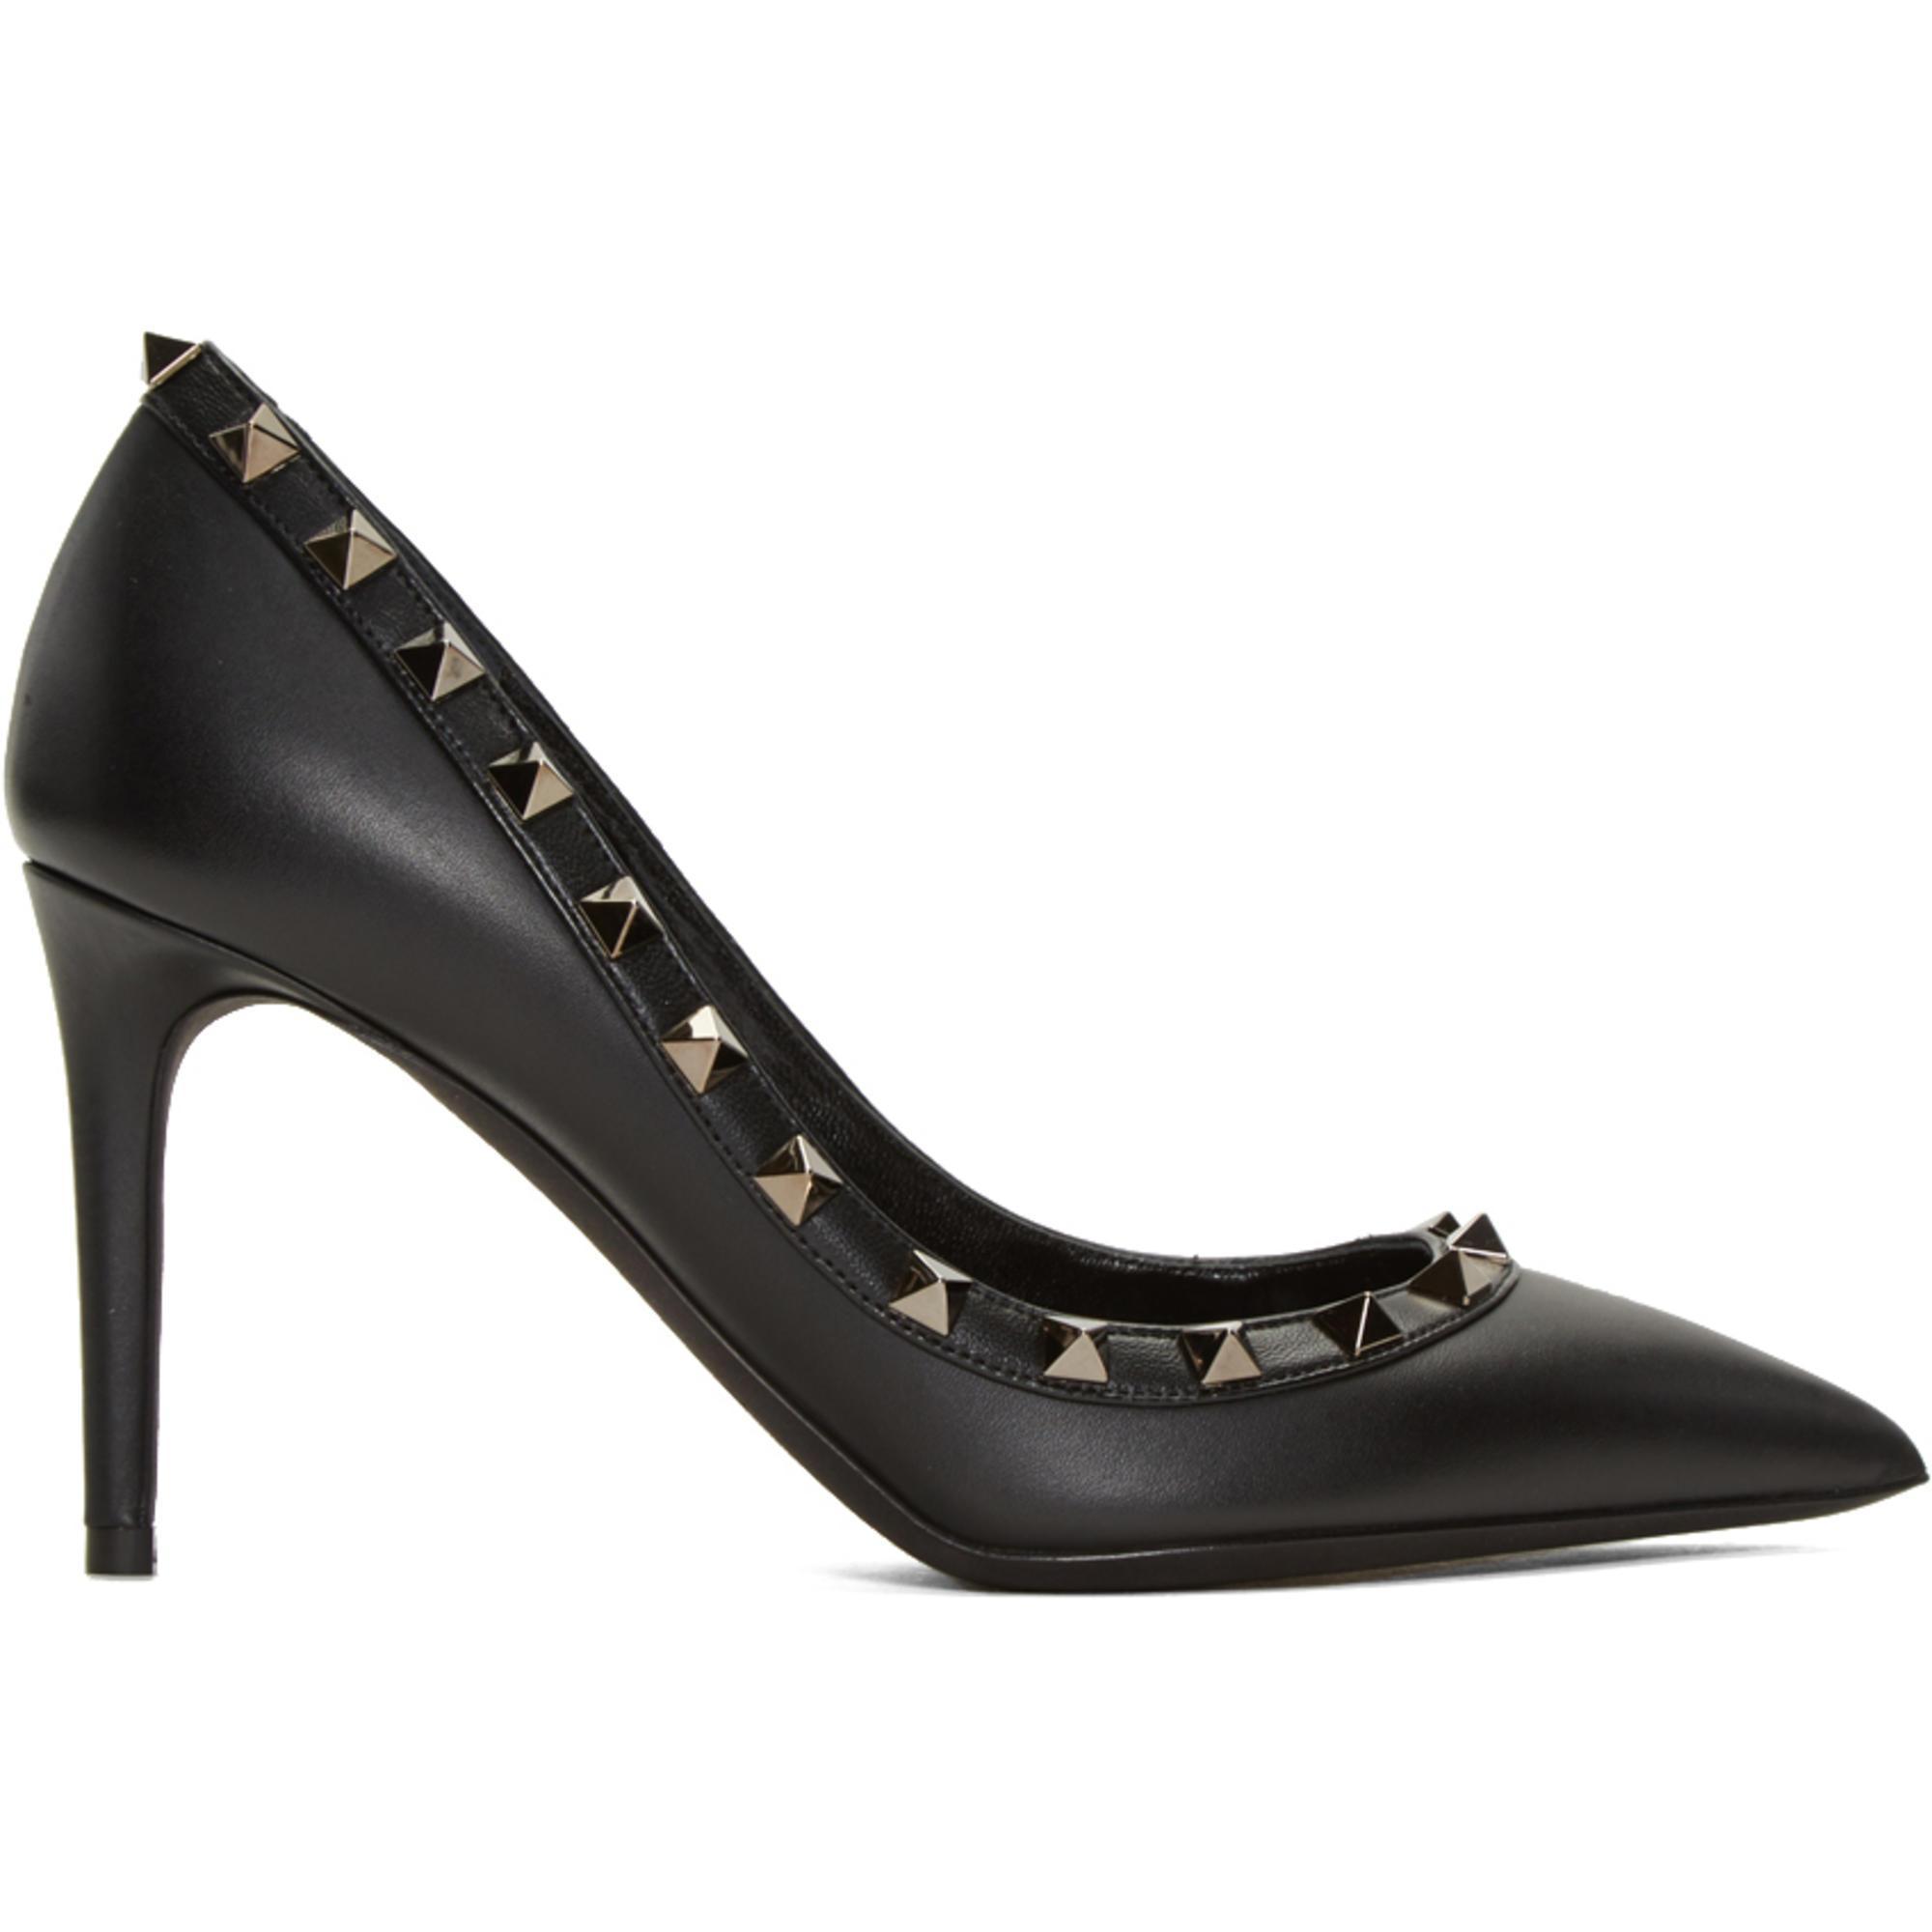 Lyst - Chaussures à talons hauts noires Rockstud Garavani Valentino ... 8be8523773cb